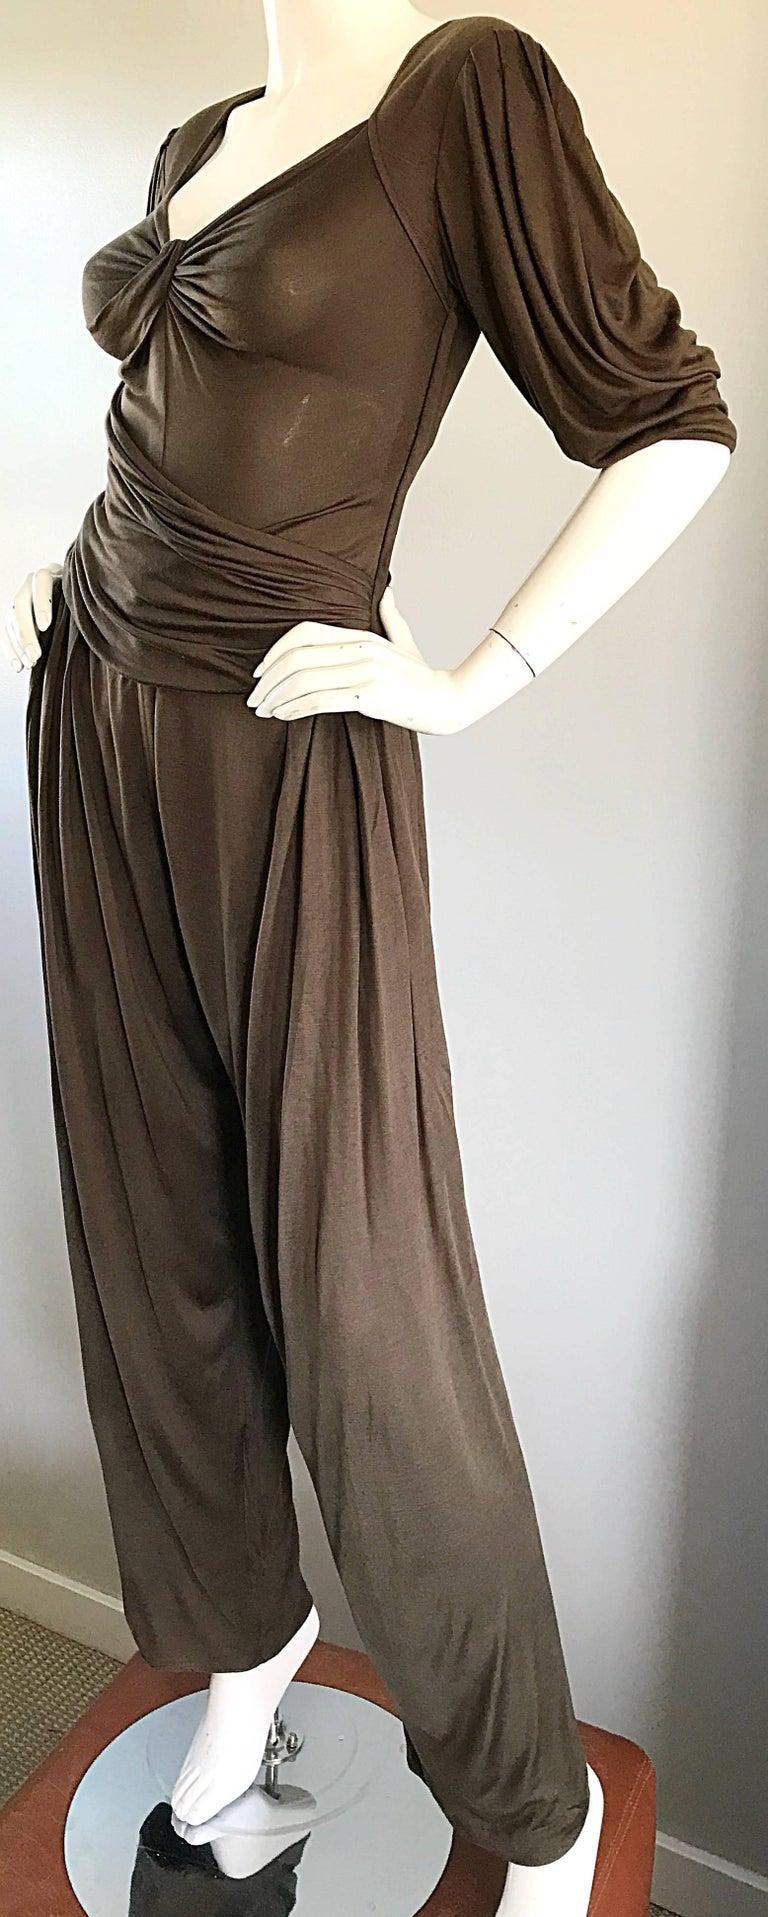 Vintage Emanuel Ungaro Silk Jersey Taupe Two Piece Harem Pants Ensemble Pant Set In Excellent Condition For Sale In Chicago, IL